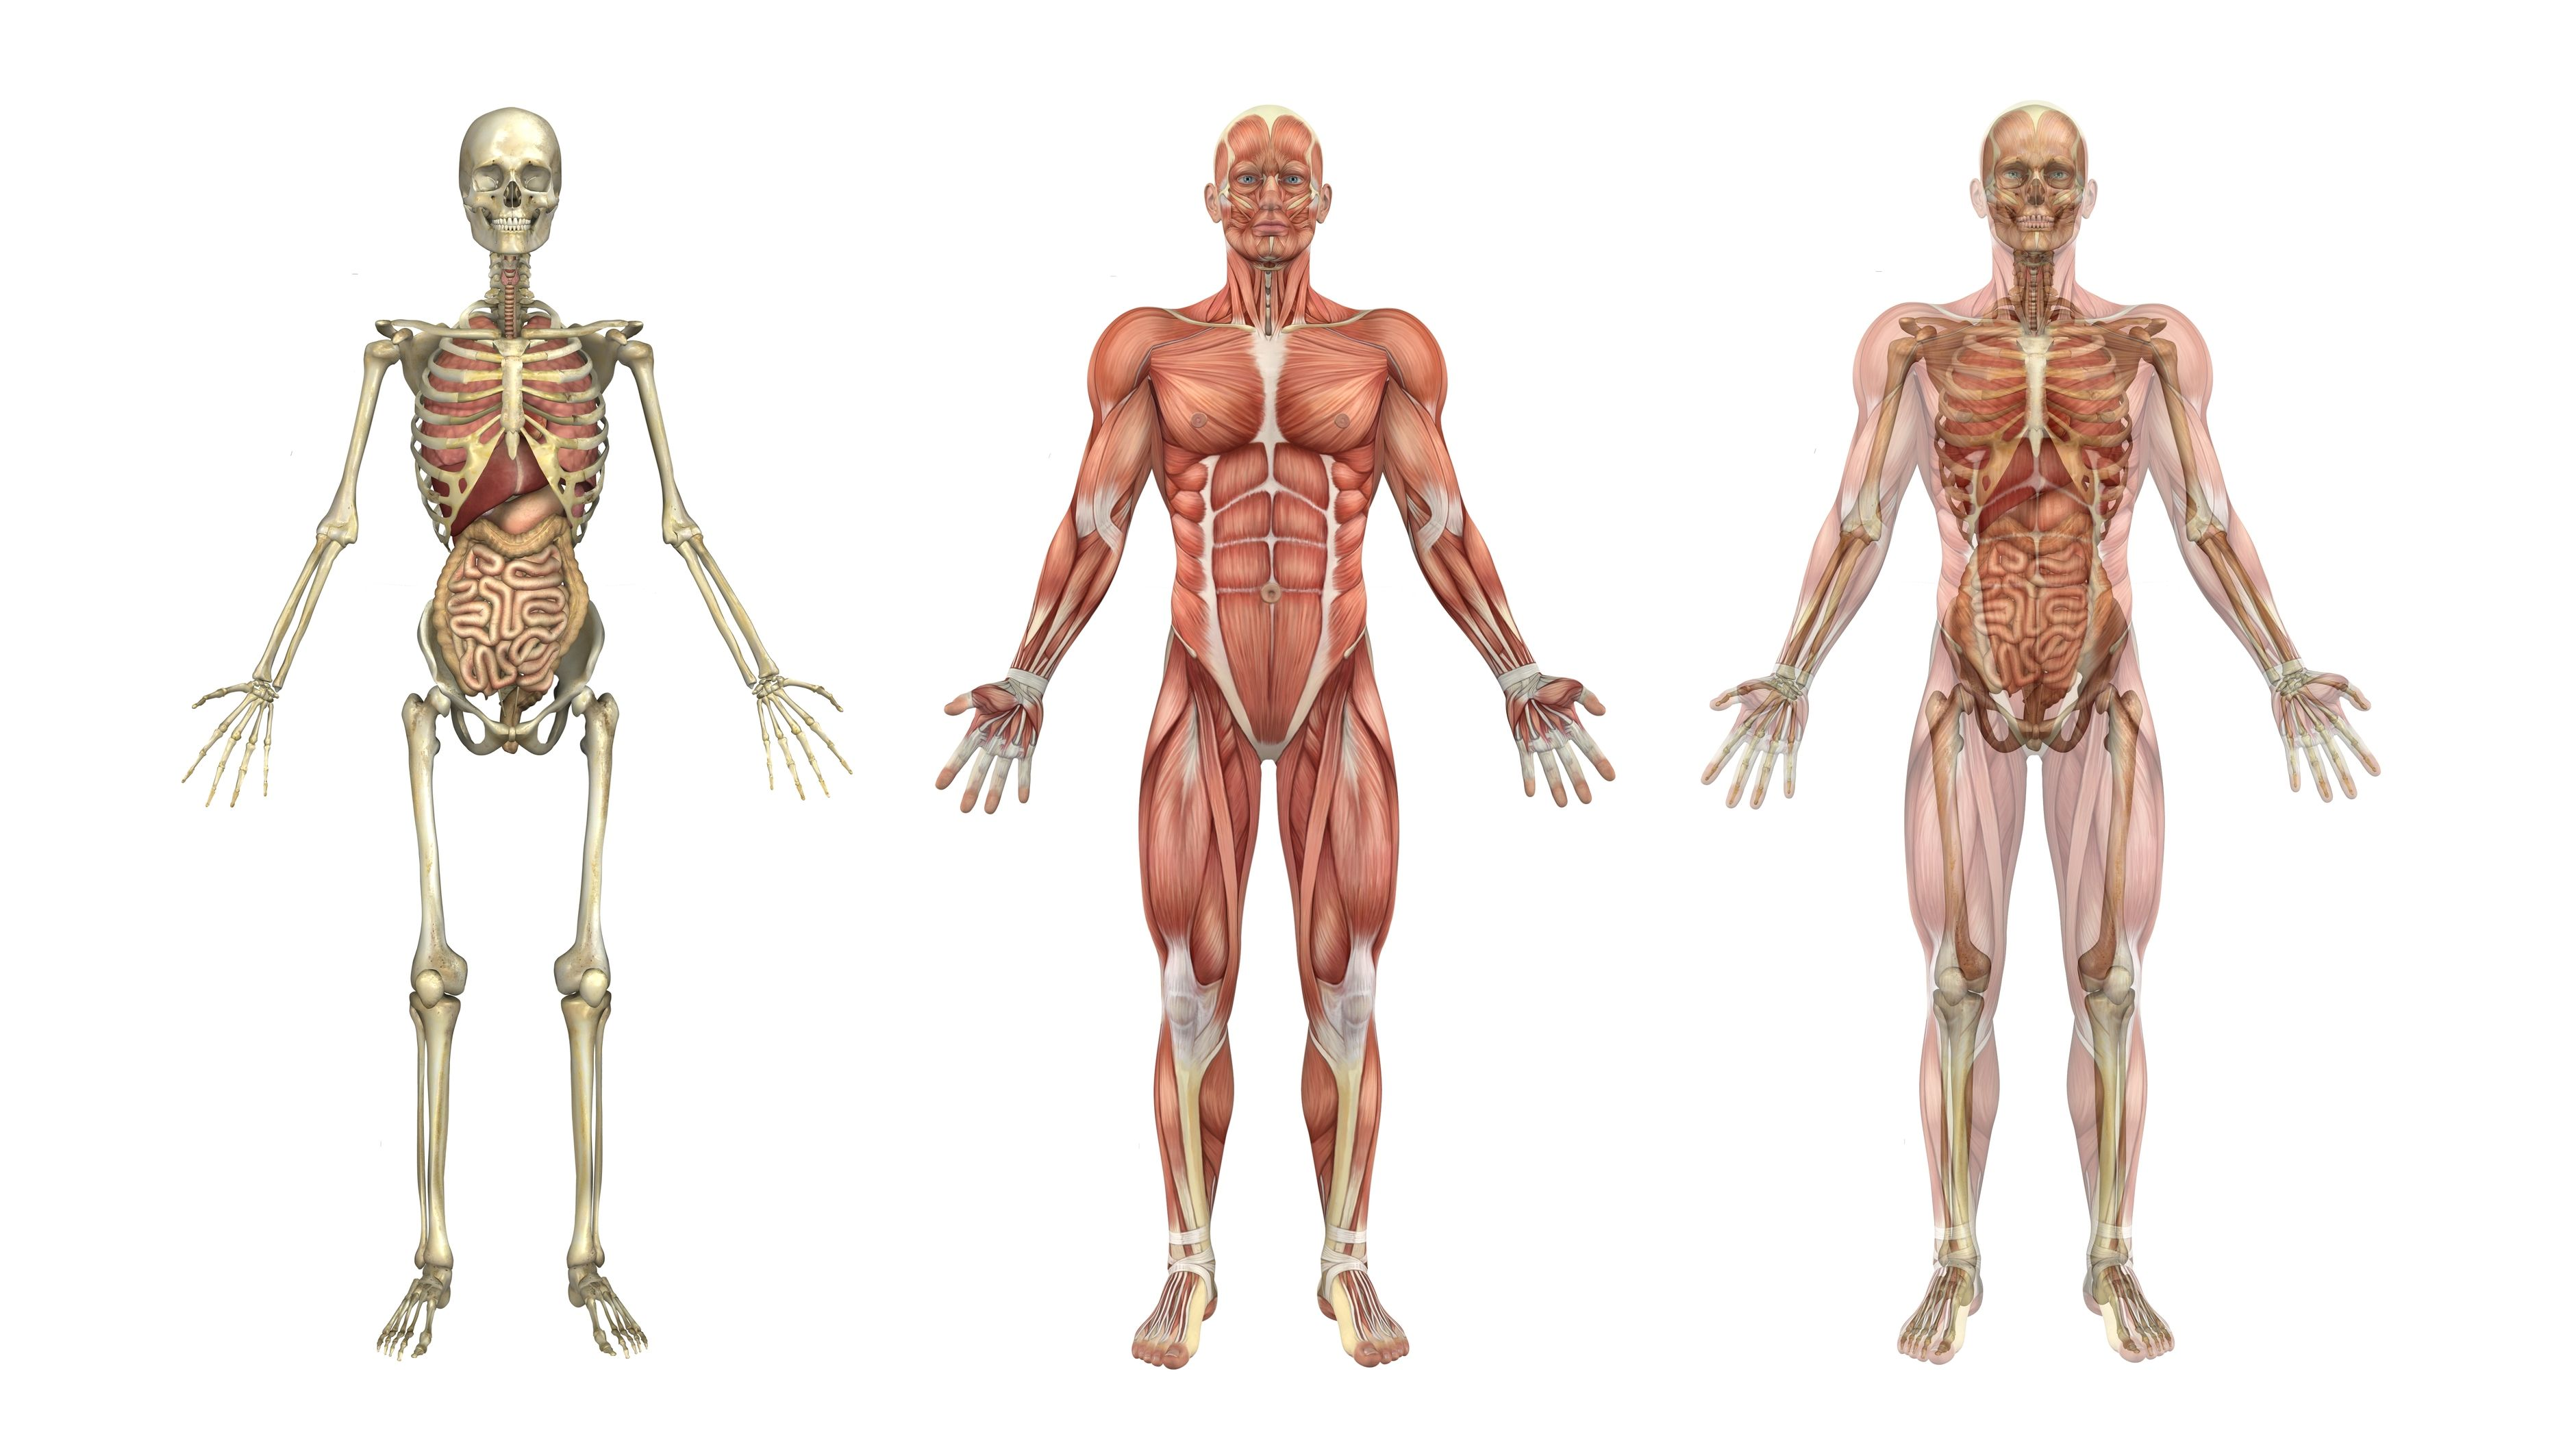 pin by anna on human anatomy bone structure | pinterest, Skeleton